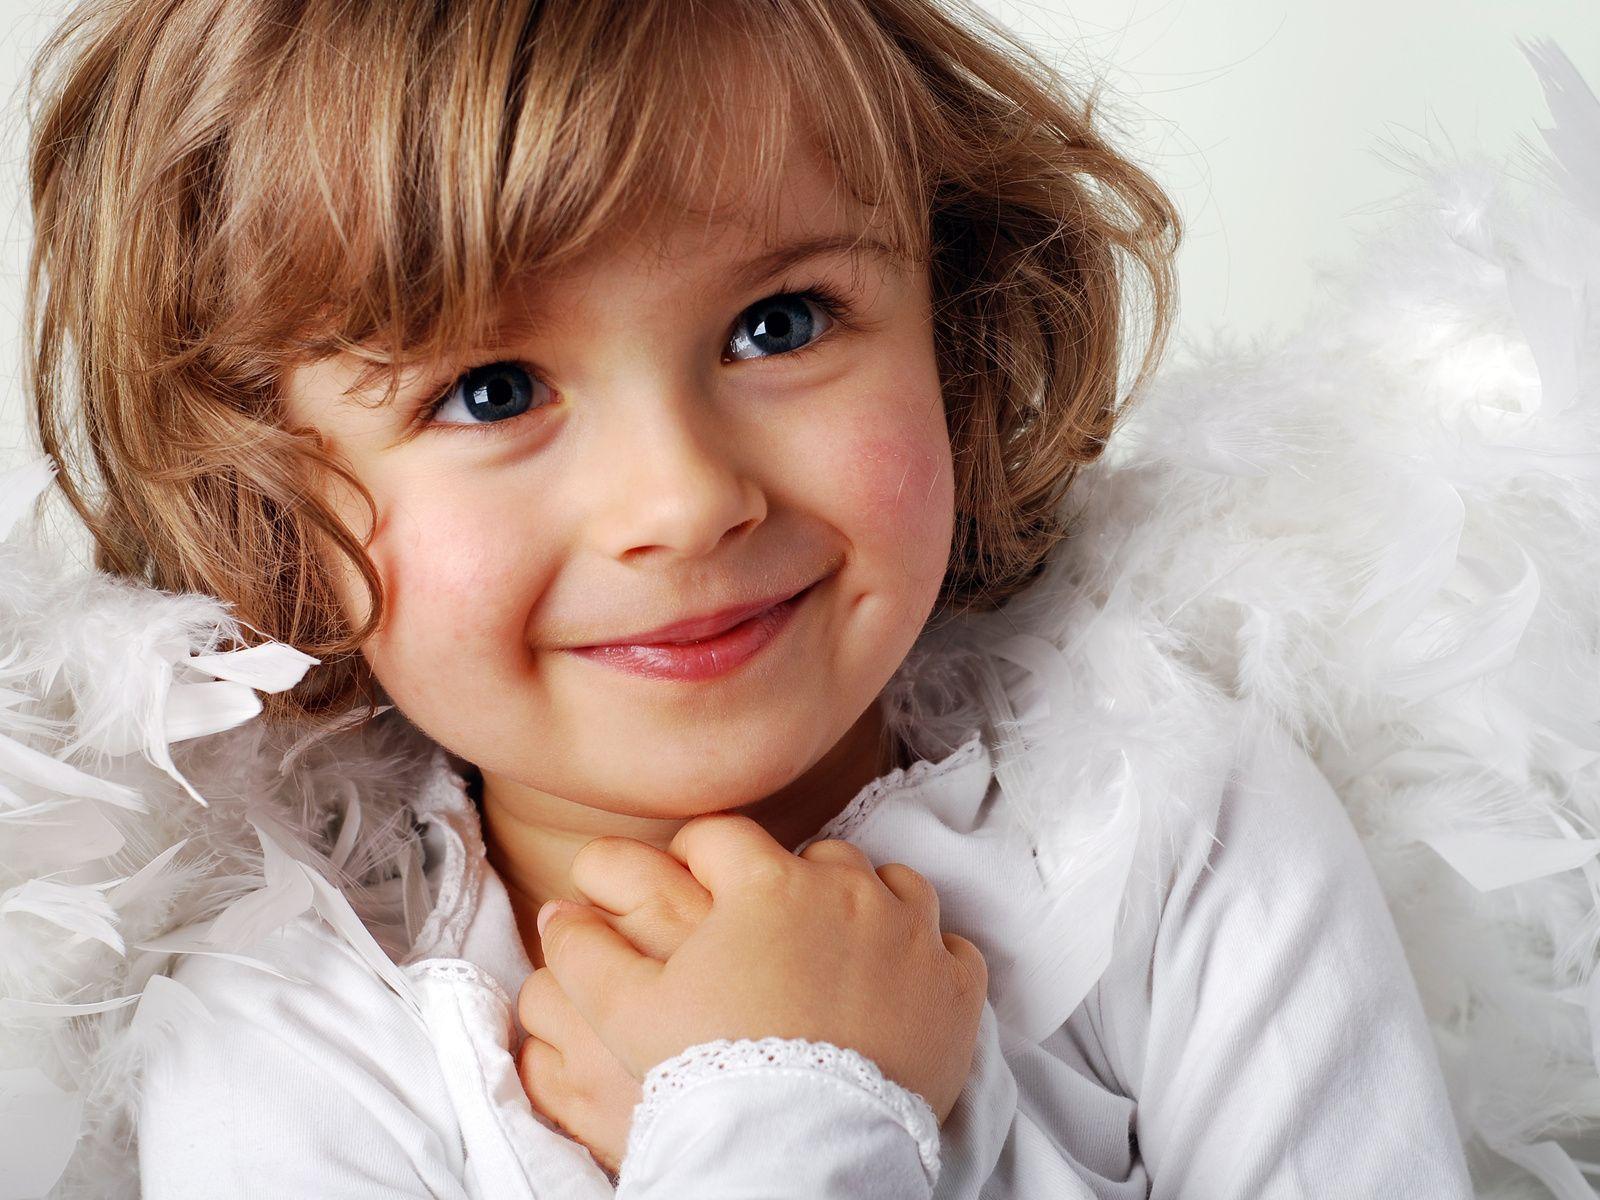 Wallpaper download baby girl - Cute Smile Baby Girl Computer Wallpaper Desktop Background Free Download